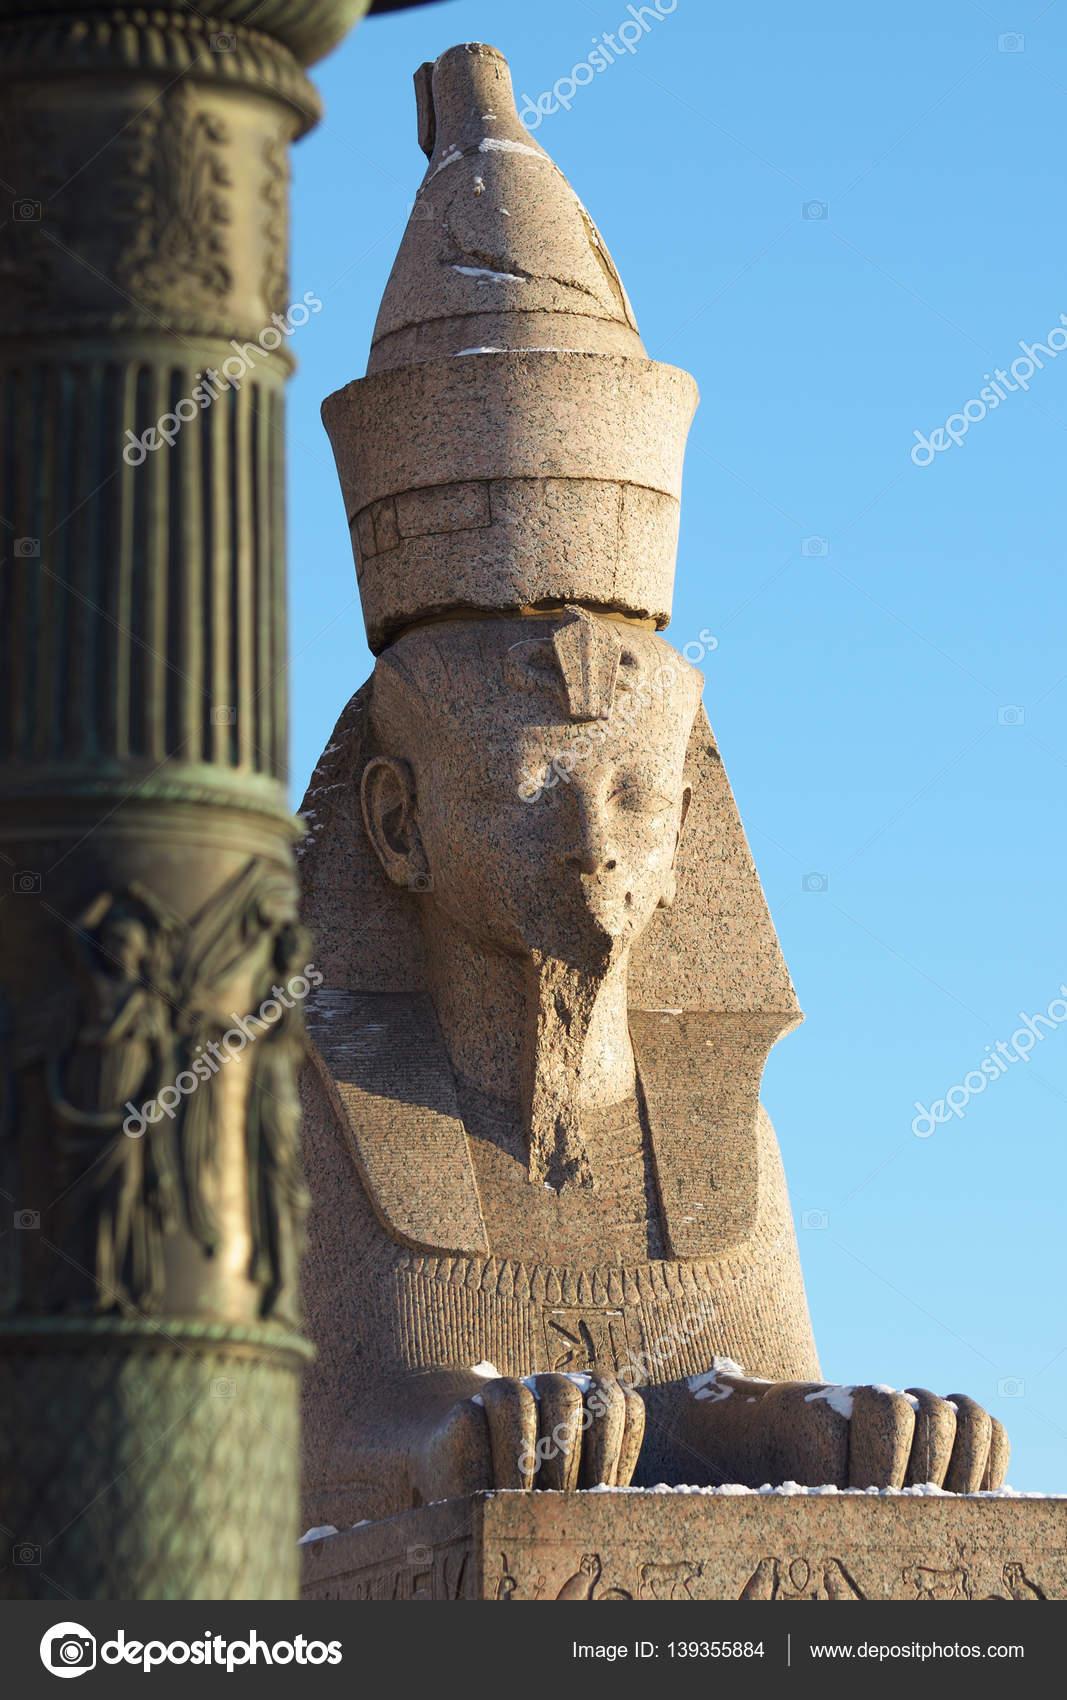 Sphinx in St. Petersburg: overview, description, history, location 34